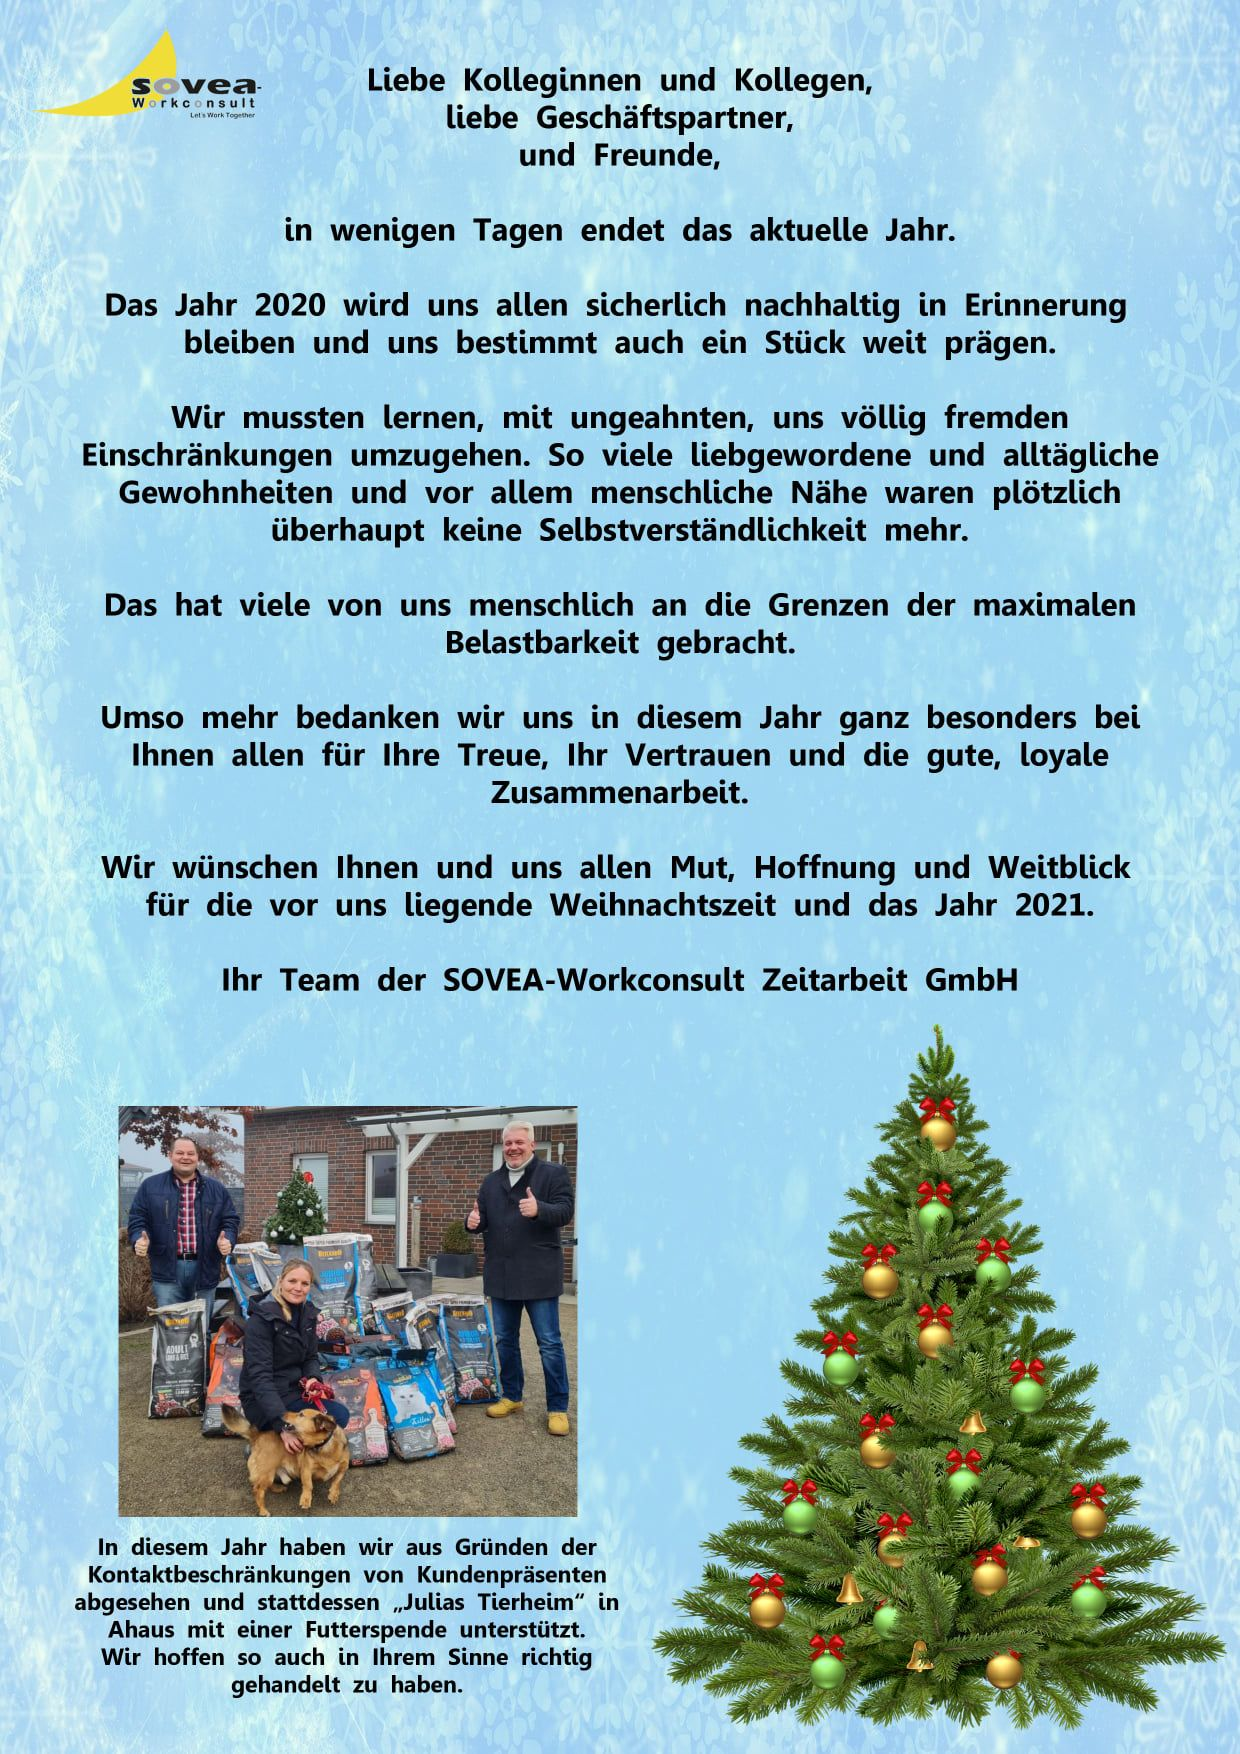 SOVEA Aktuell | SOVEA-Workconsult Zeitarbeit GmbH